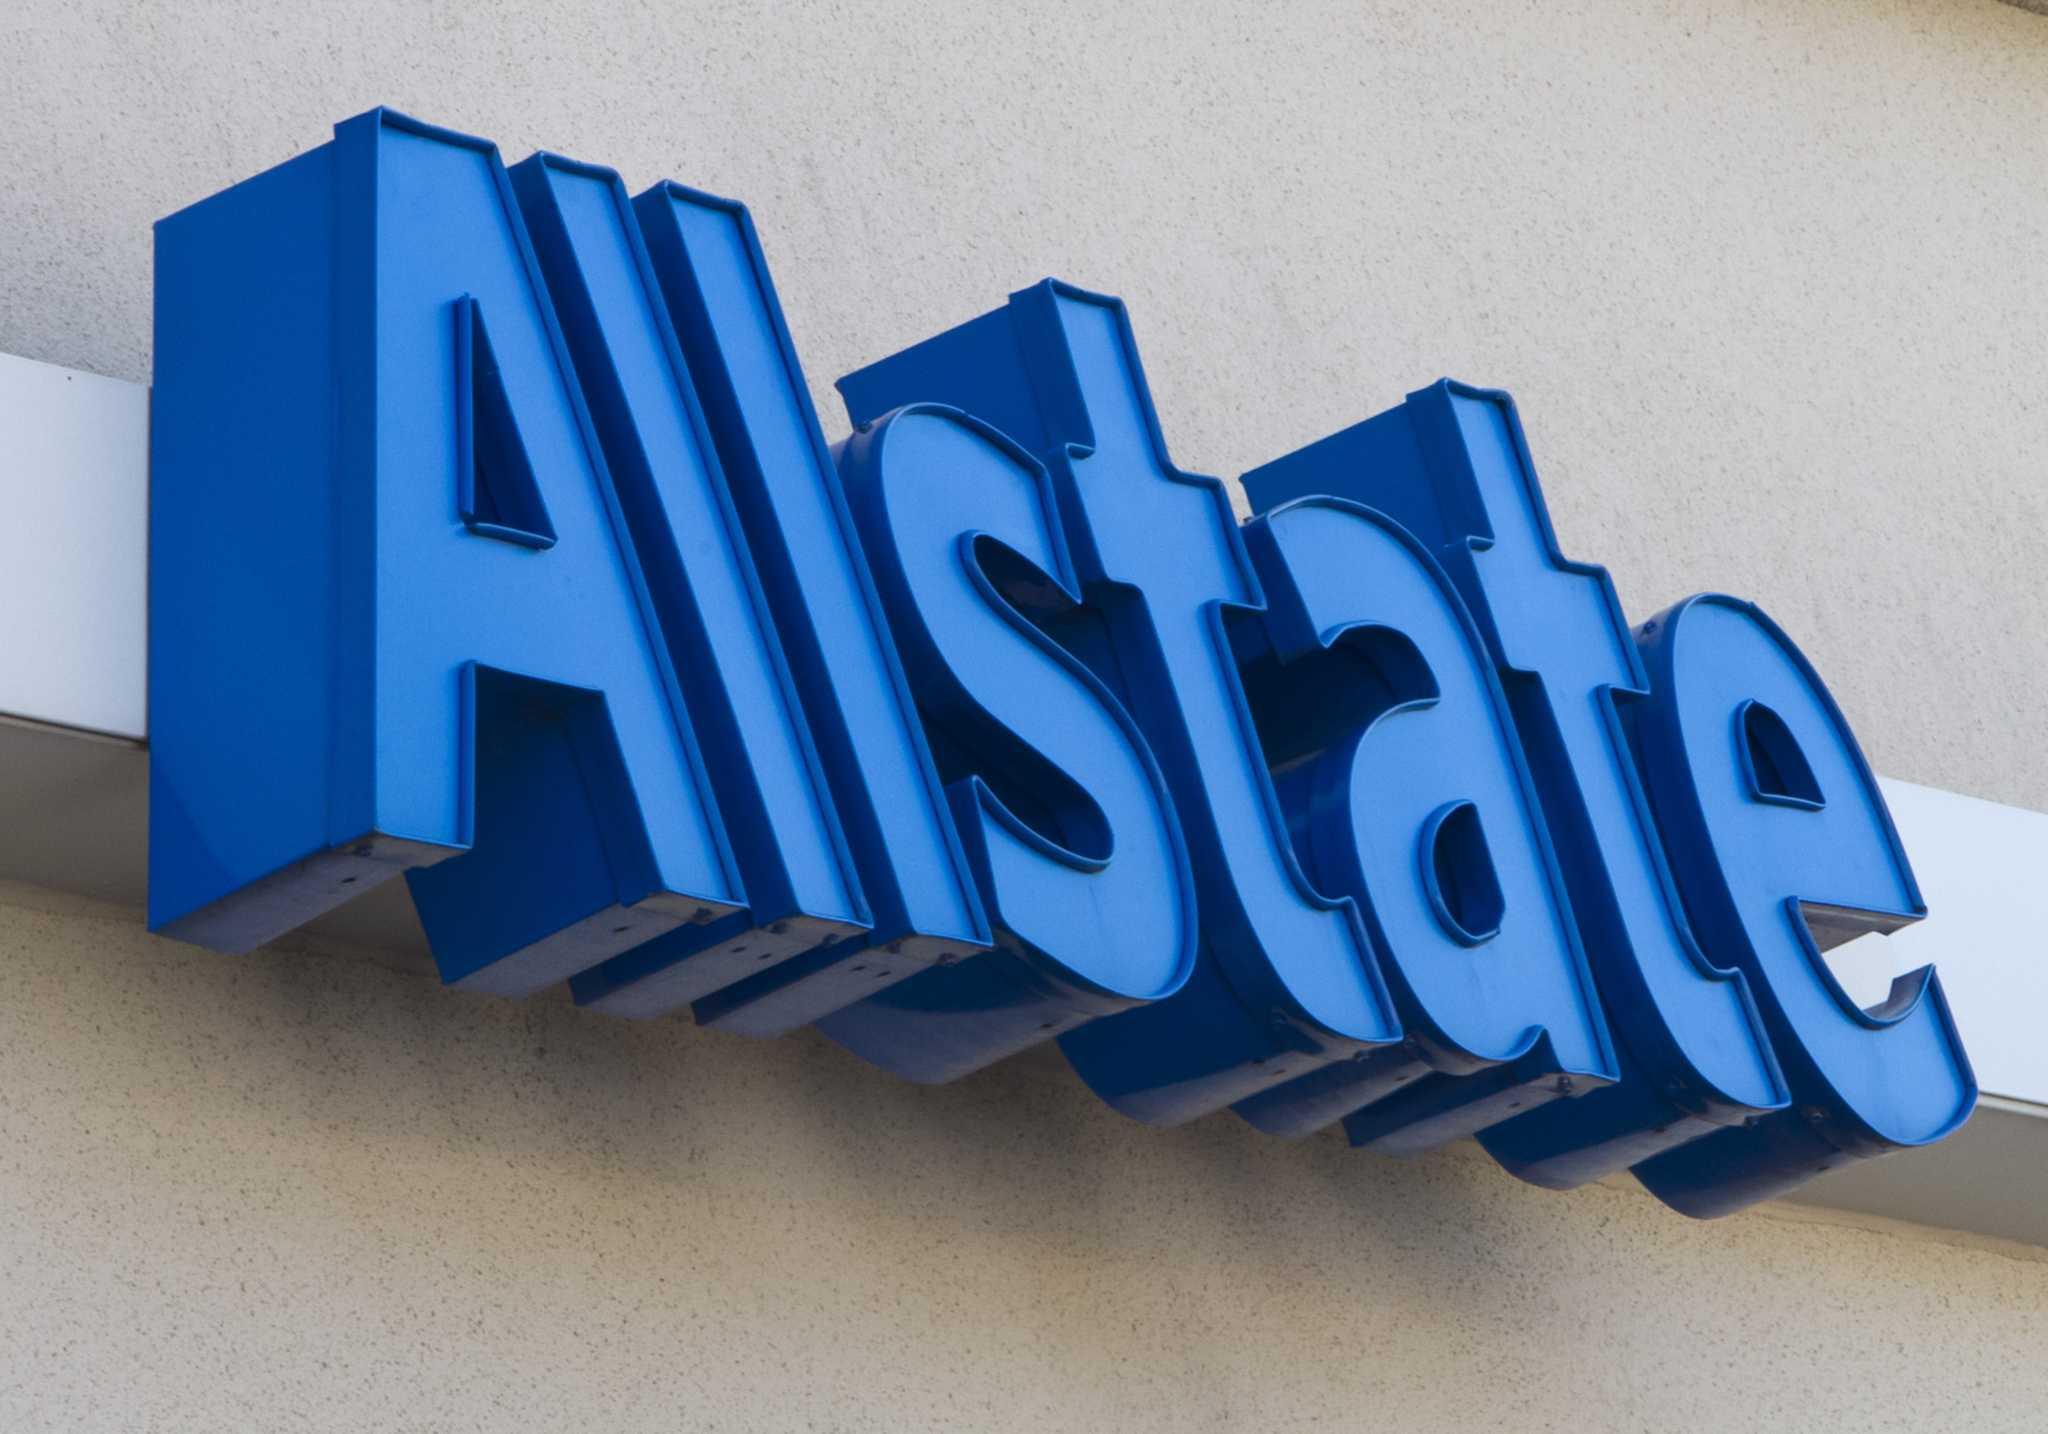 Allstate aims to bring 2,000 jobs to Texas at 150 new agencies